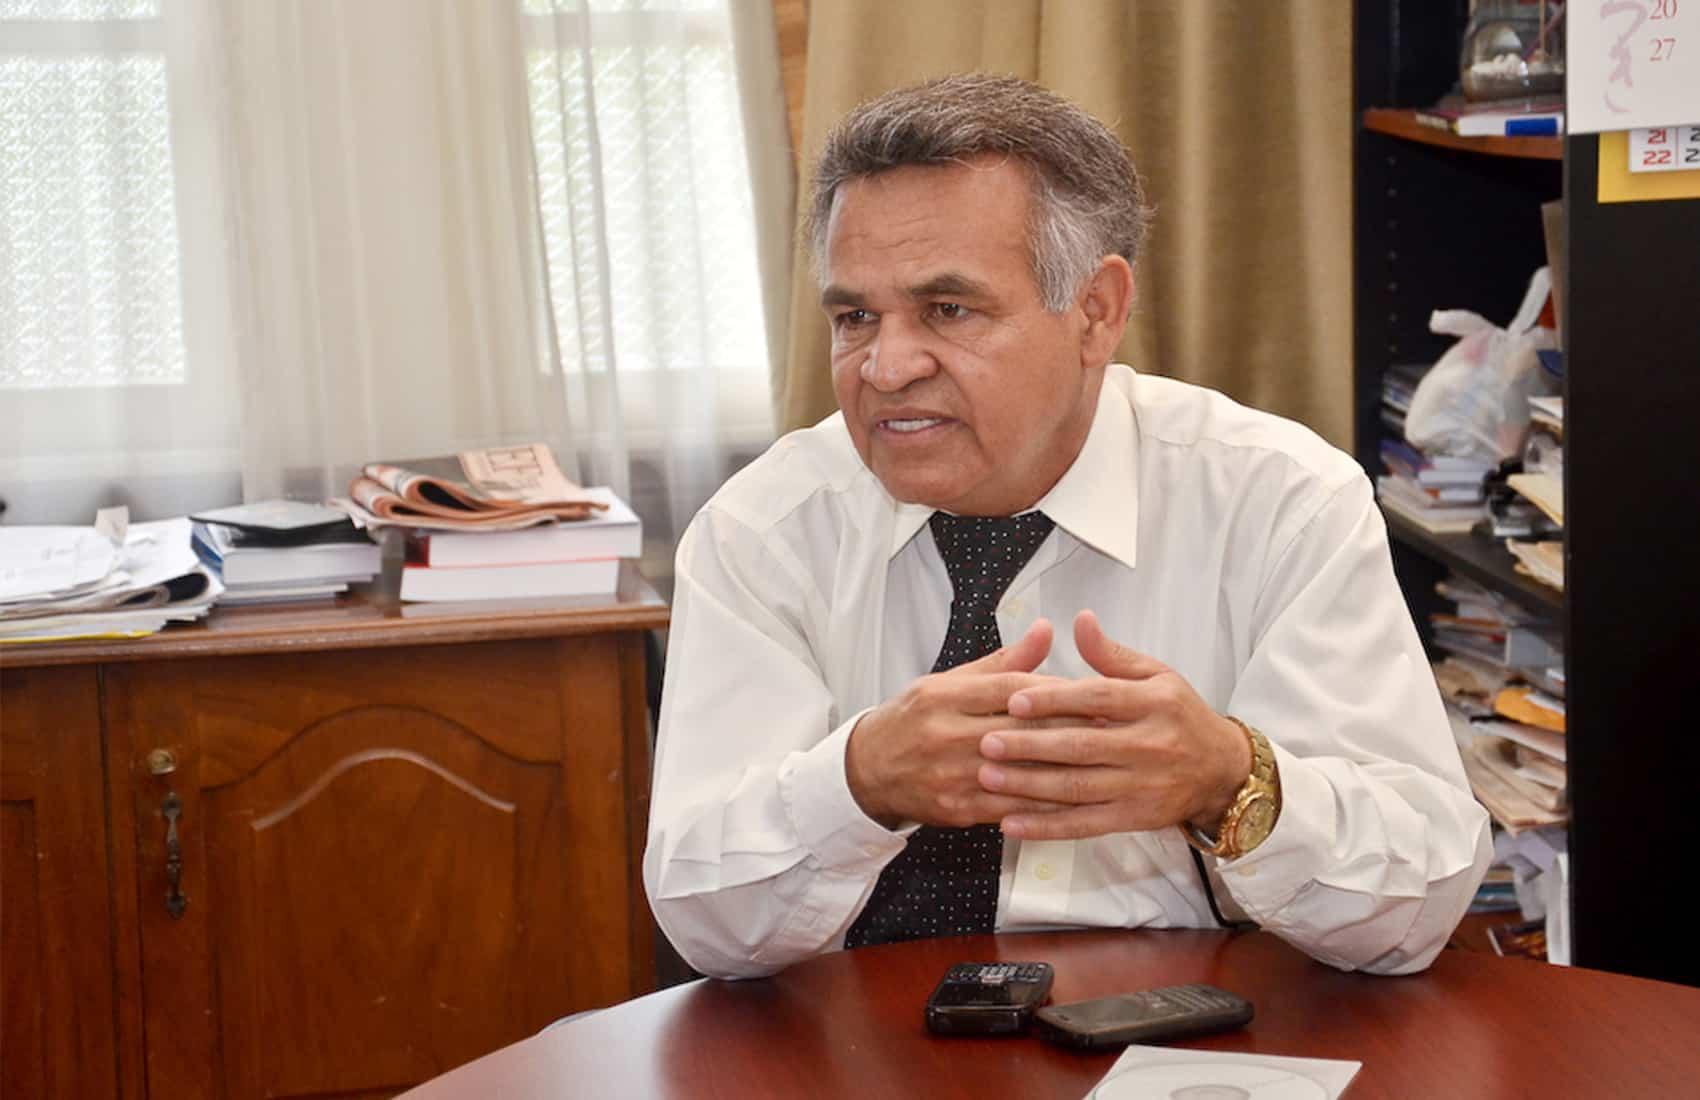 Lawmaker Justo Orozco